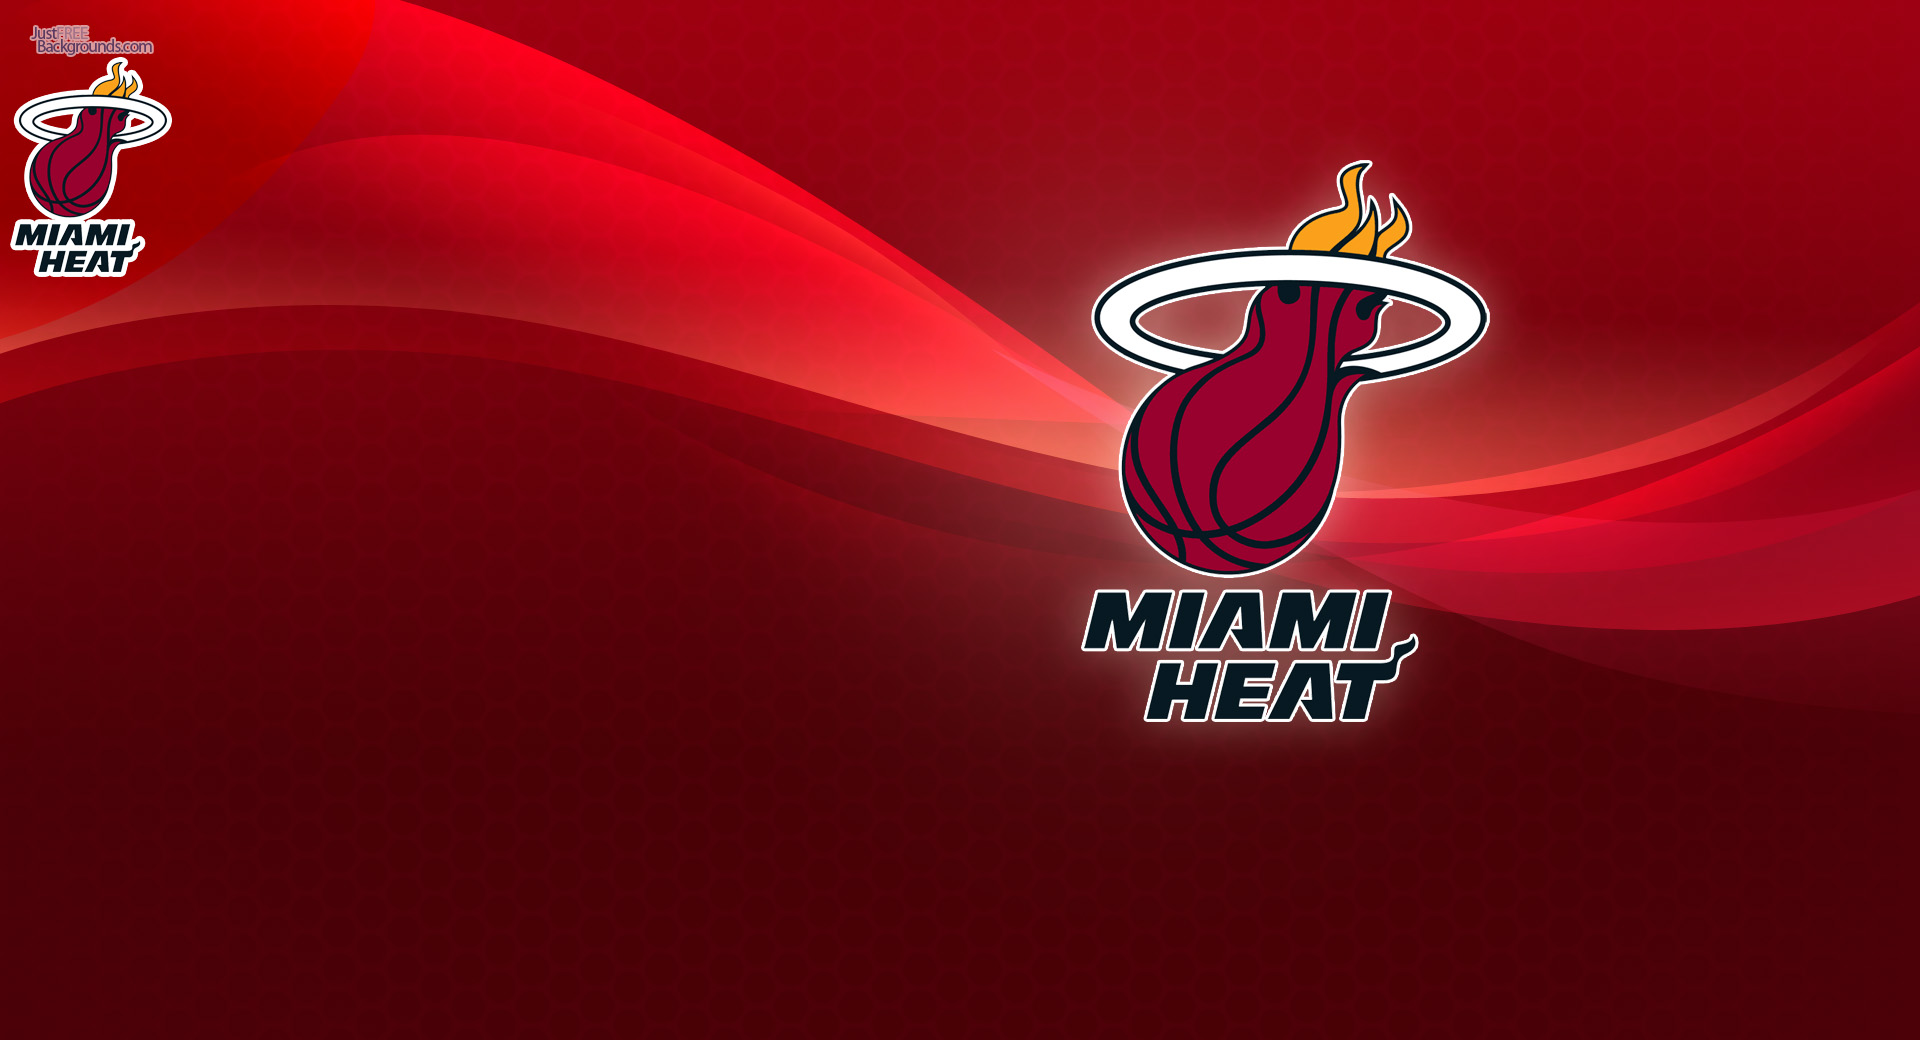 Dwyane Wade 3 Miami Heat Exclusive HD Wallpapers 1775 1920x1040